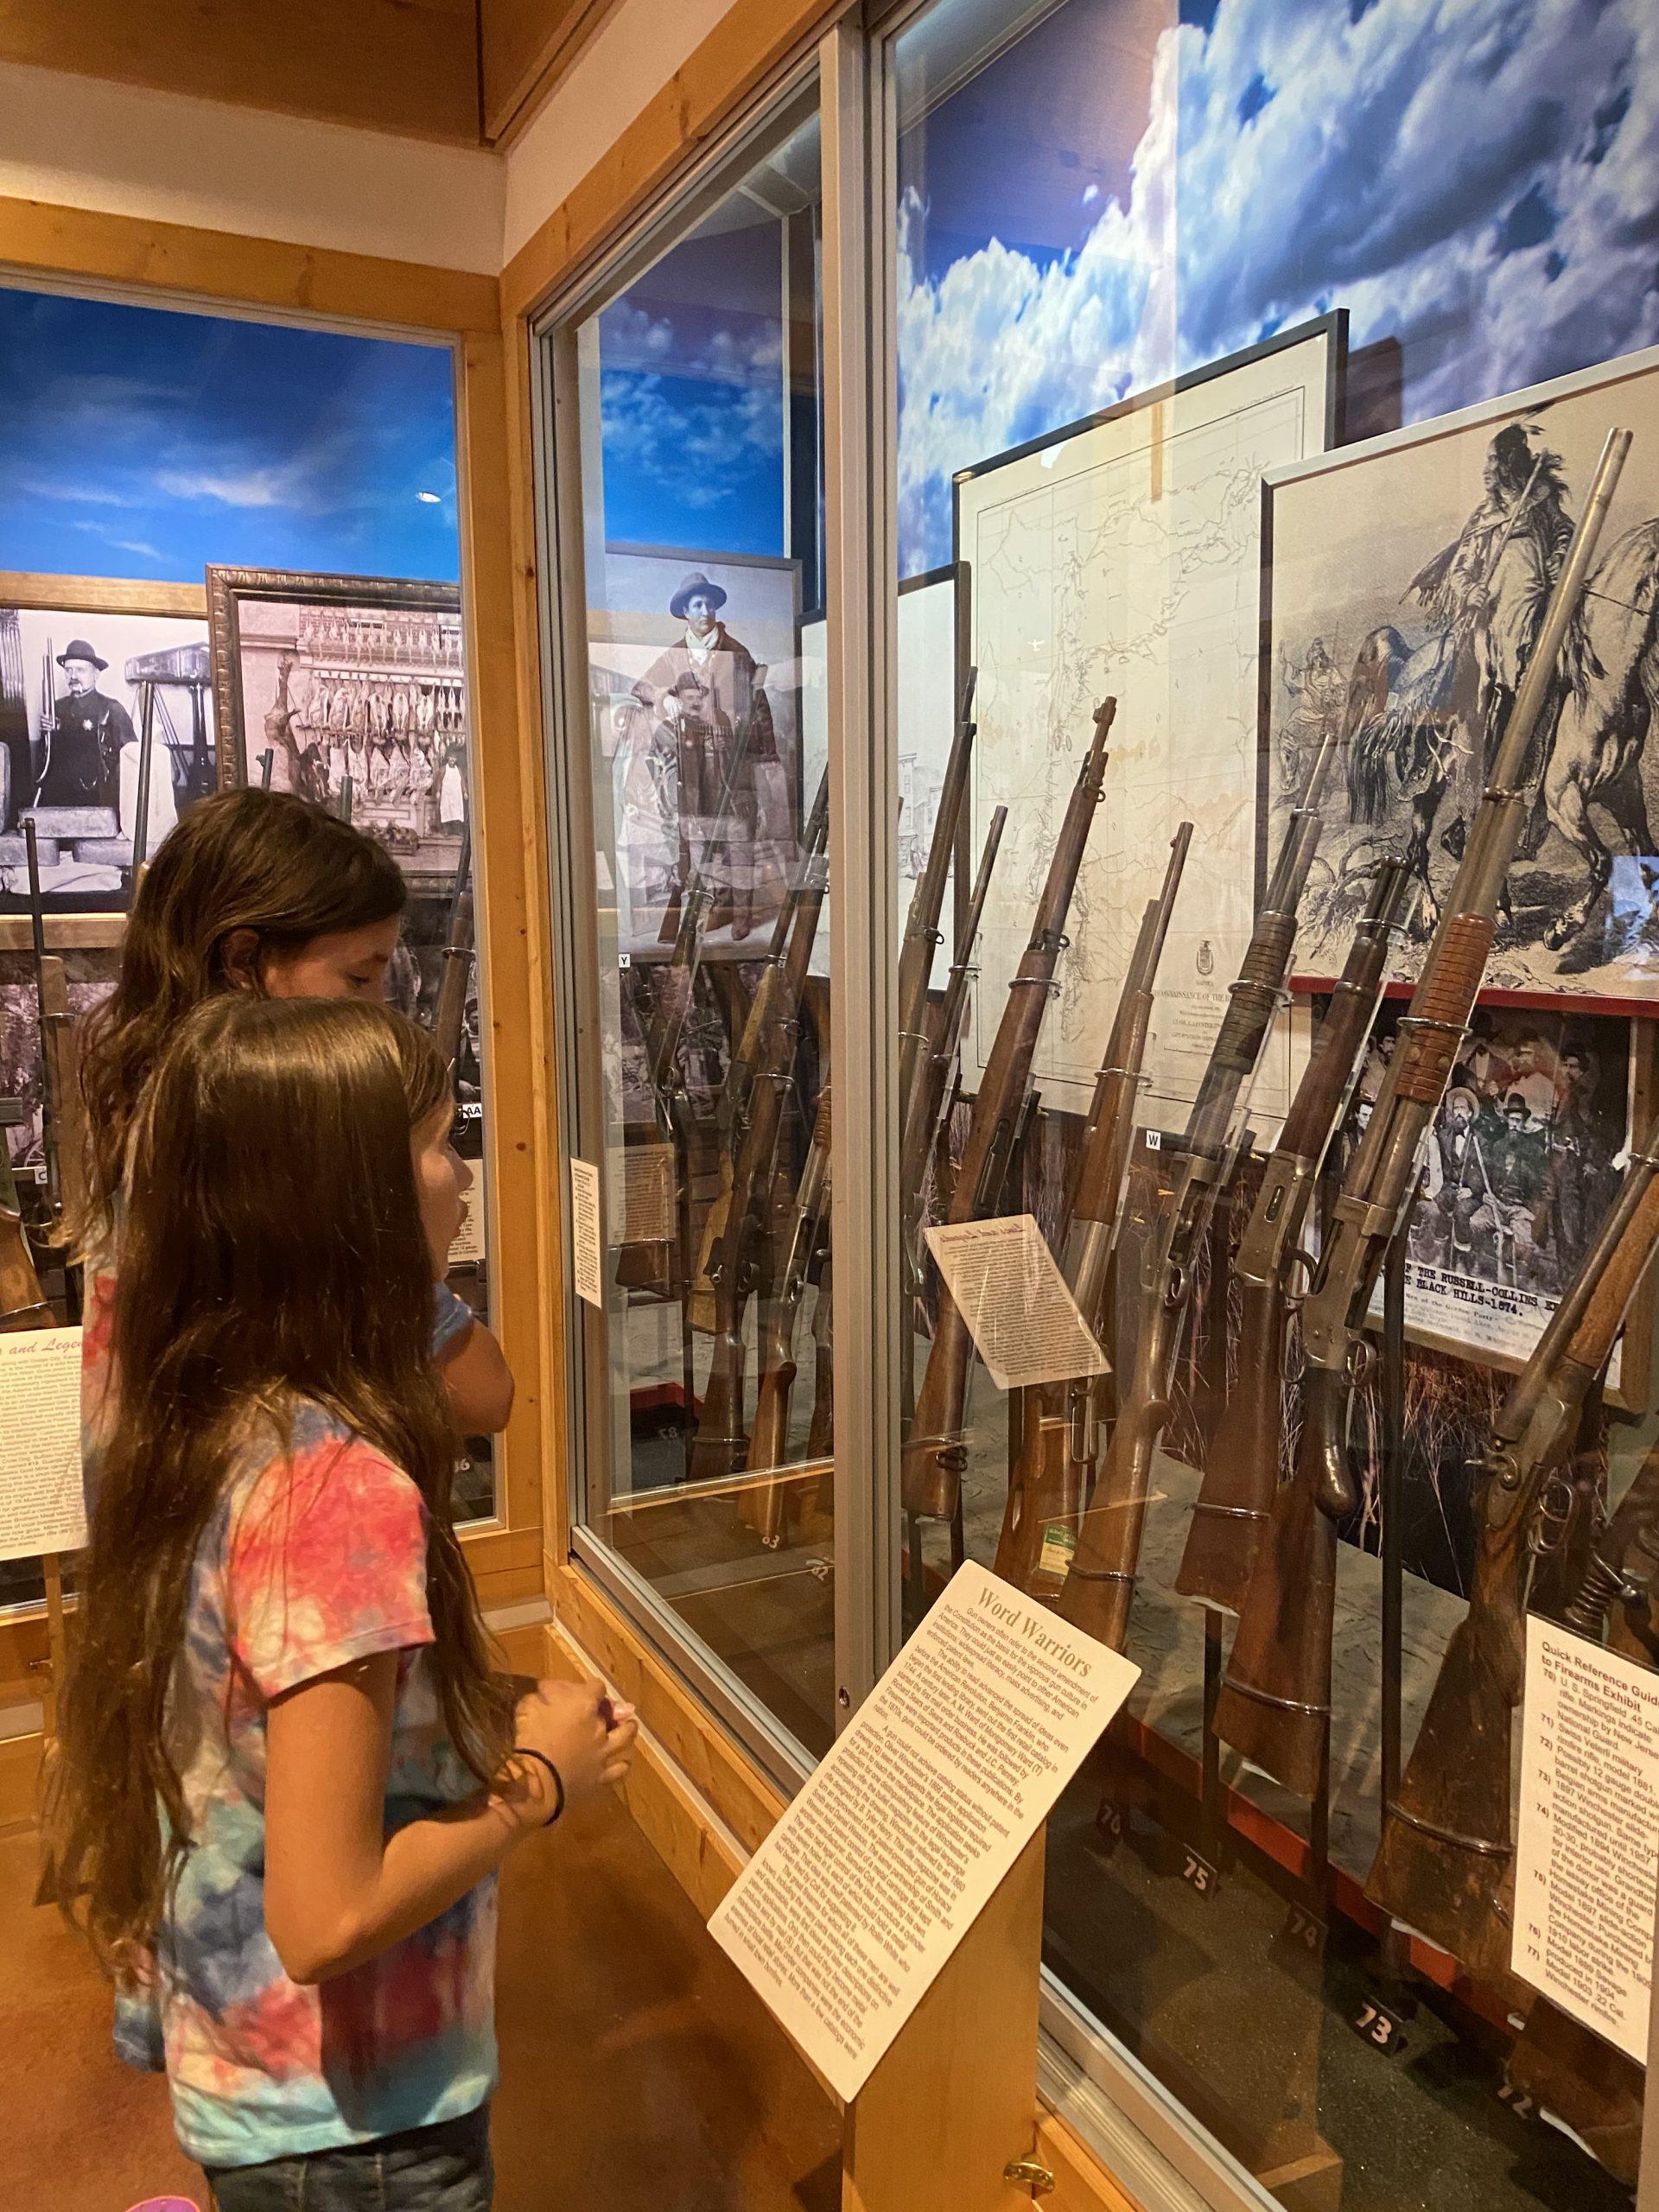 Days of '76 museum in Deadwood South Dakota